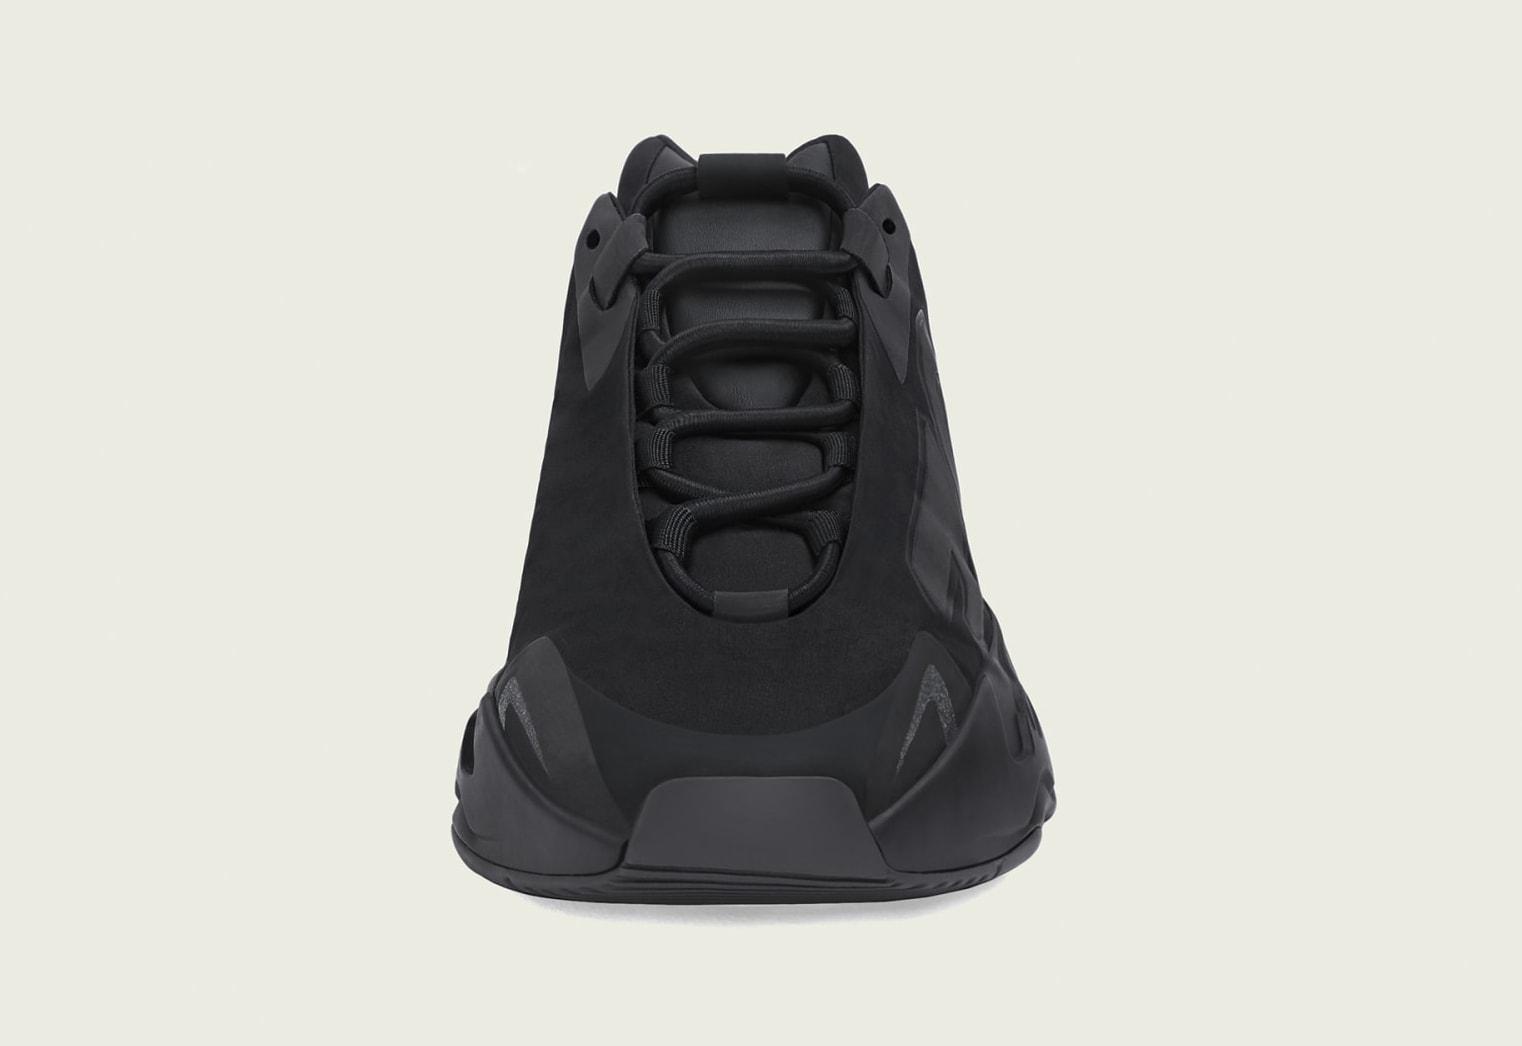 Adidas Yeezy Boost 700 MNVN 'Black' FV4440 Front